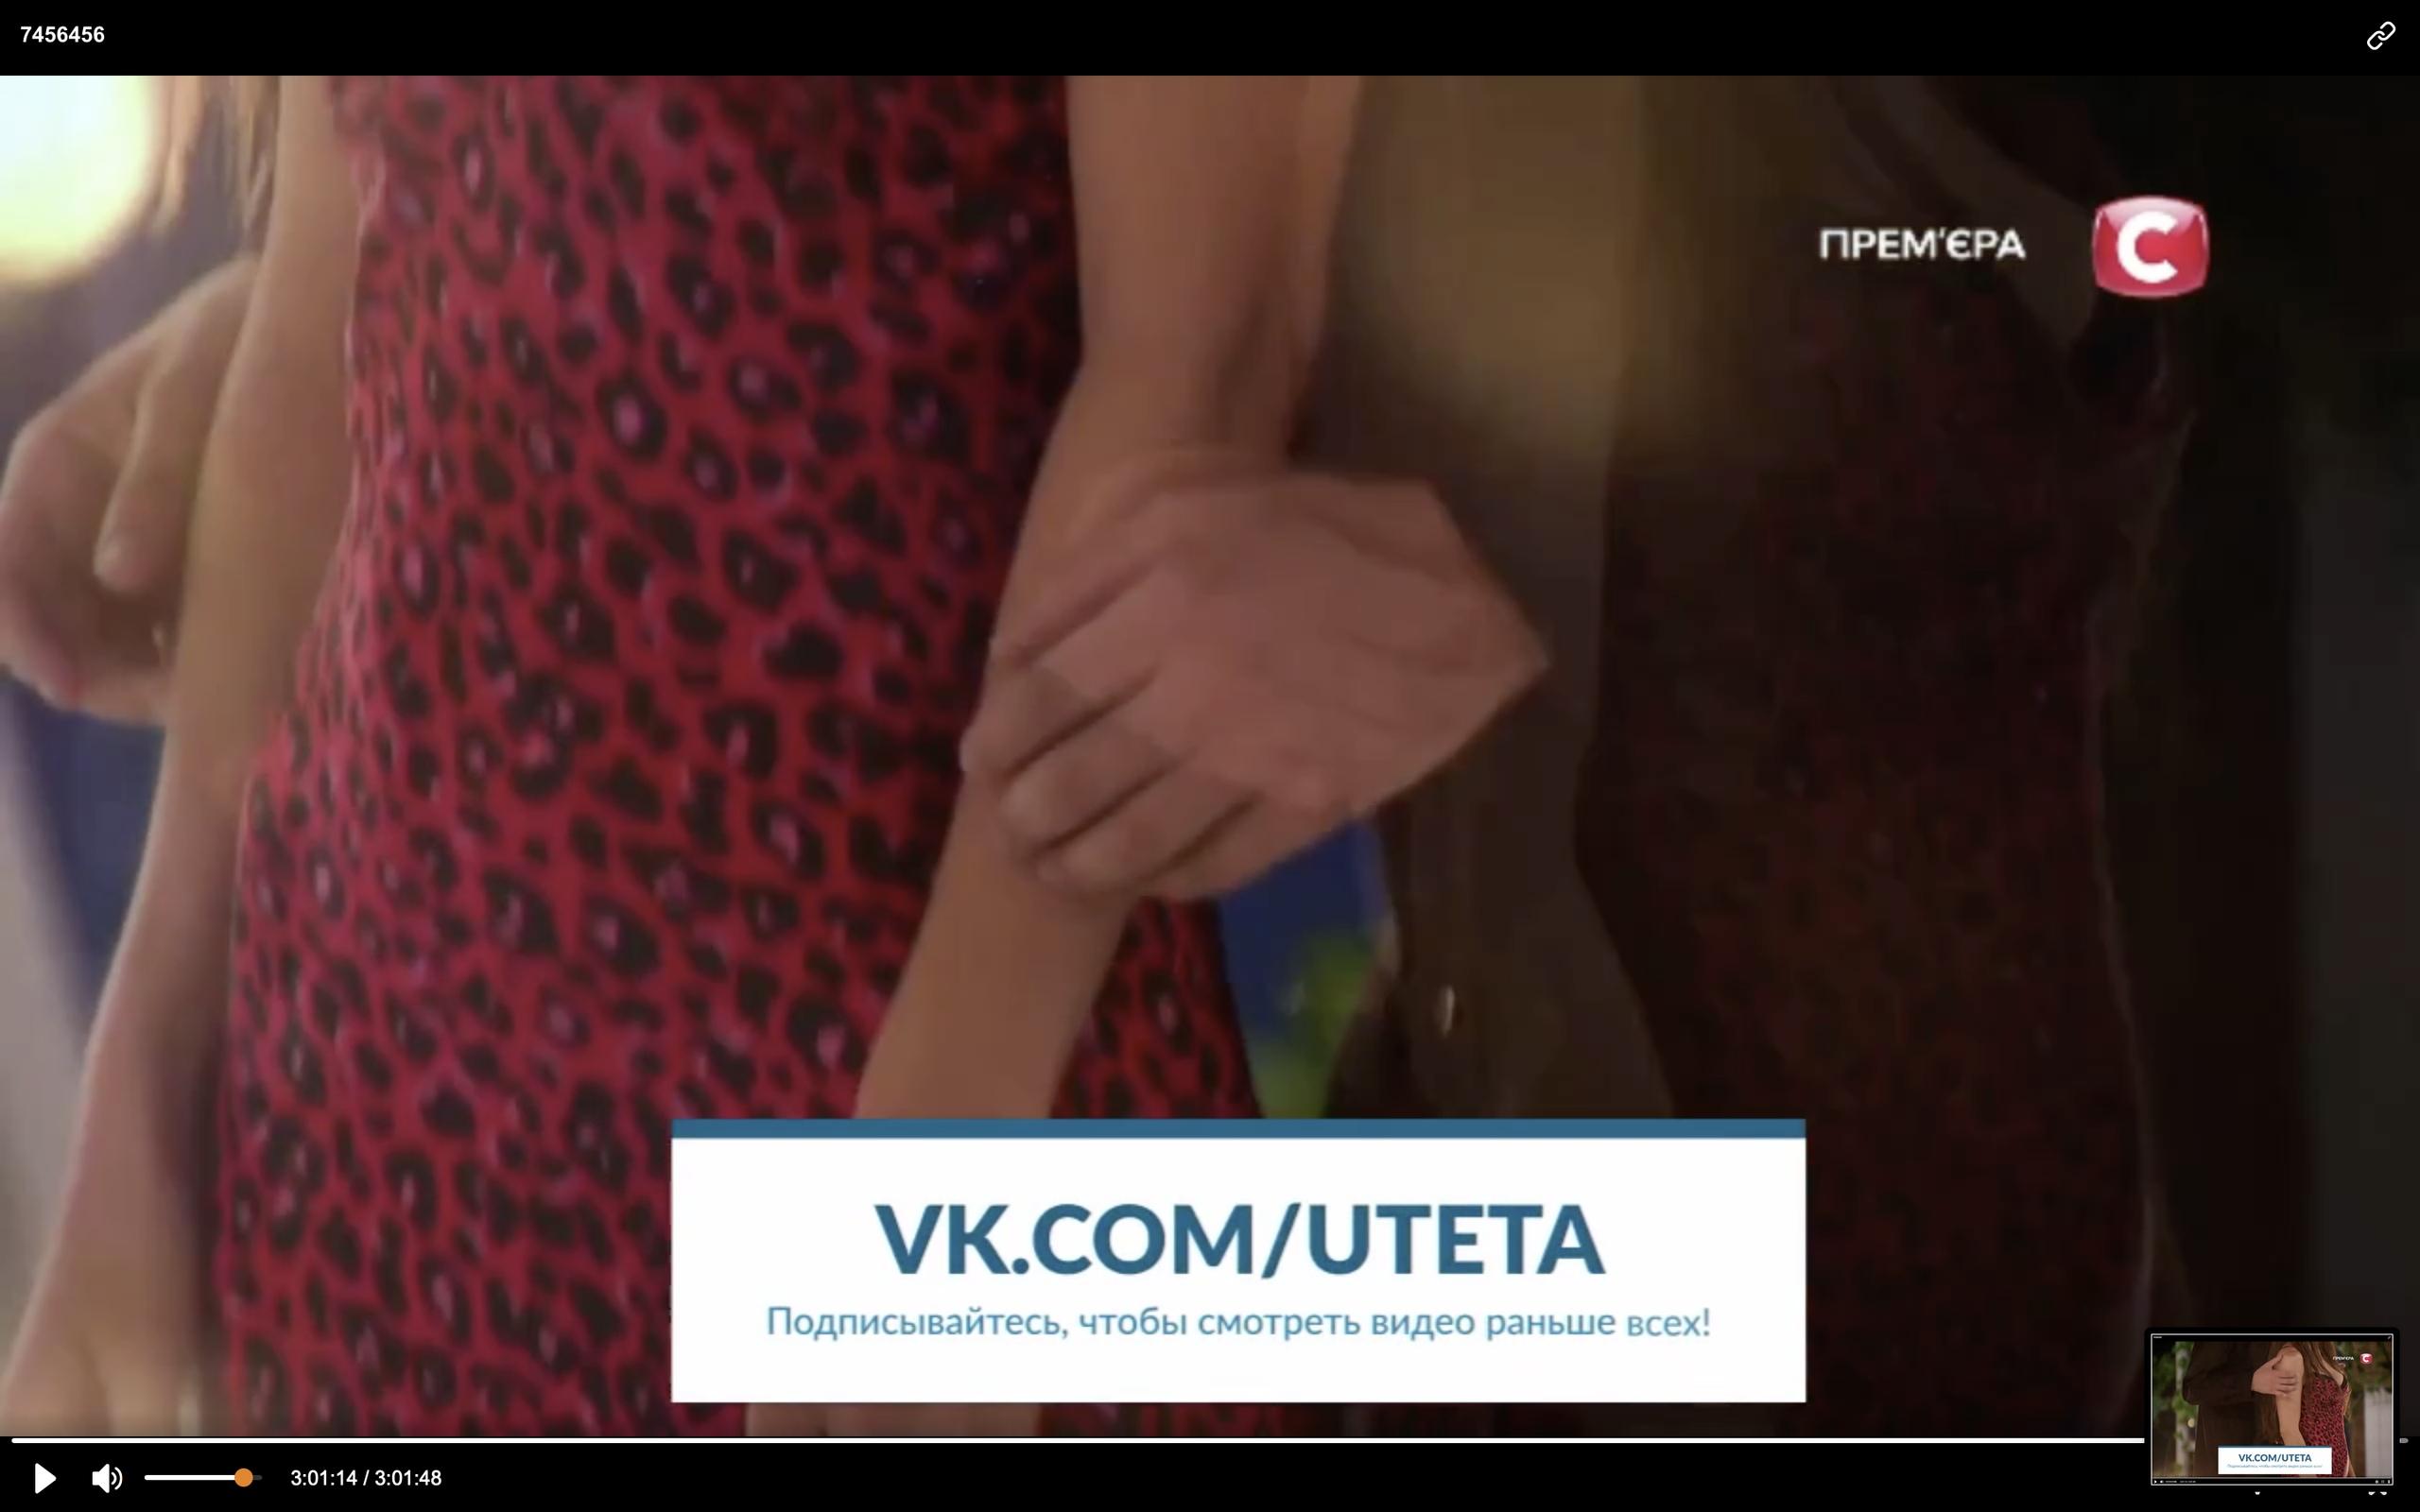 Bachelorette Ukraine - Season 1 - Ksenia Mishina - Episode Discussion - *Sleuthing Spoilers* - Page 5 7xXCmdnYBU8